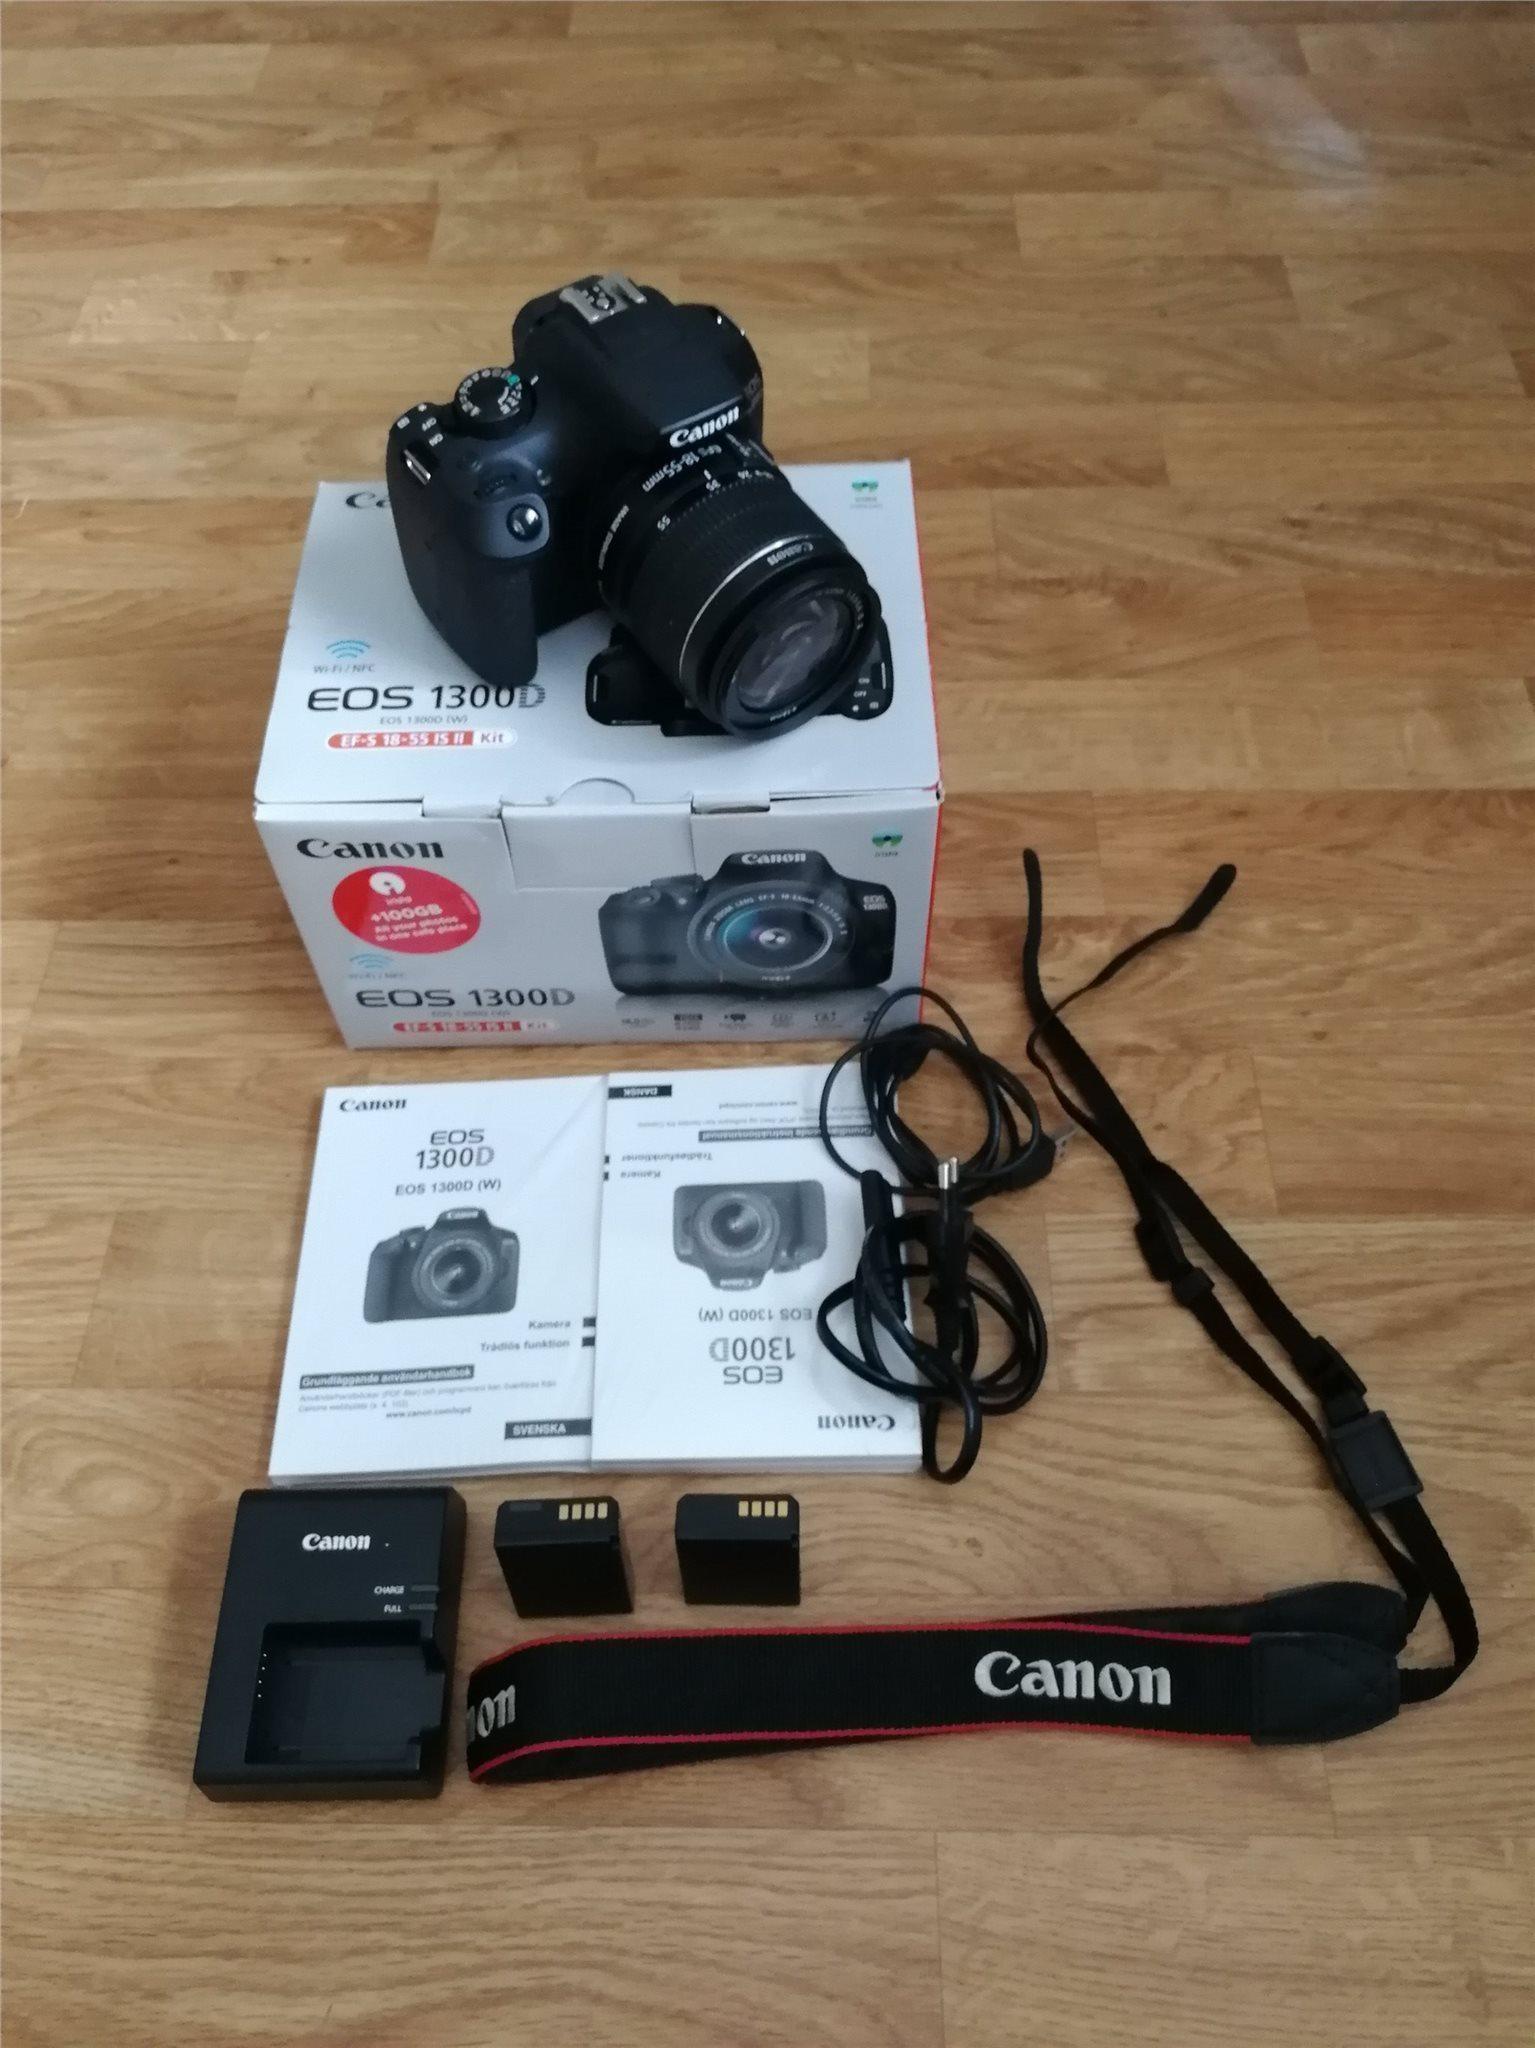 Canon Eos 1300d 18 55 Is Ii Ett 64gb Minnes 321946440 Kp Digital With Lens 55mm Minneskort